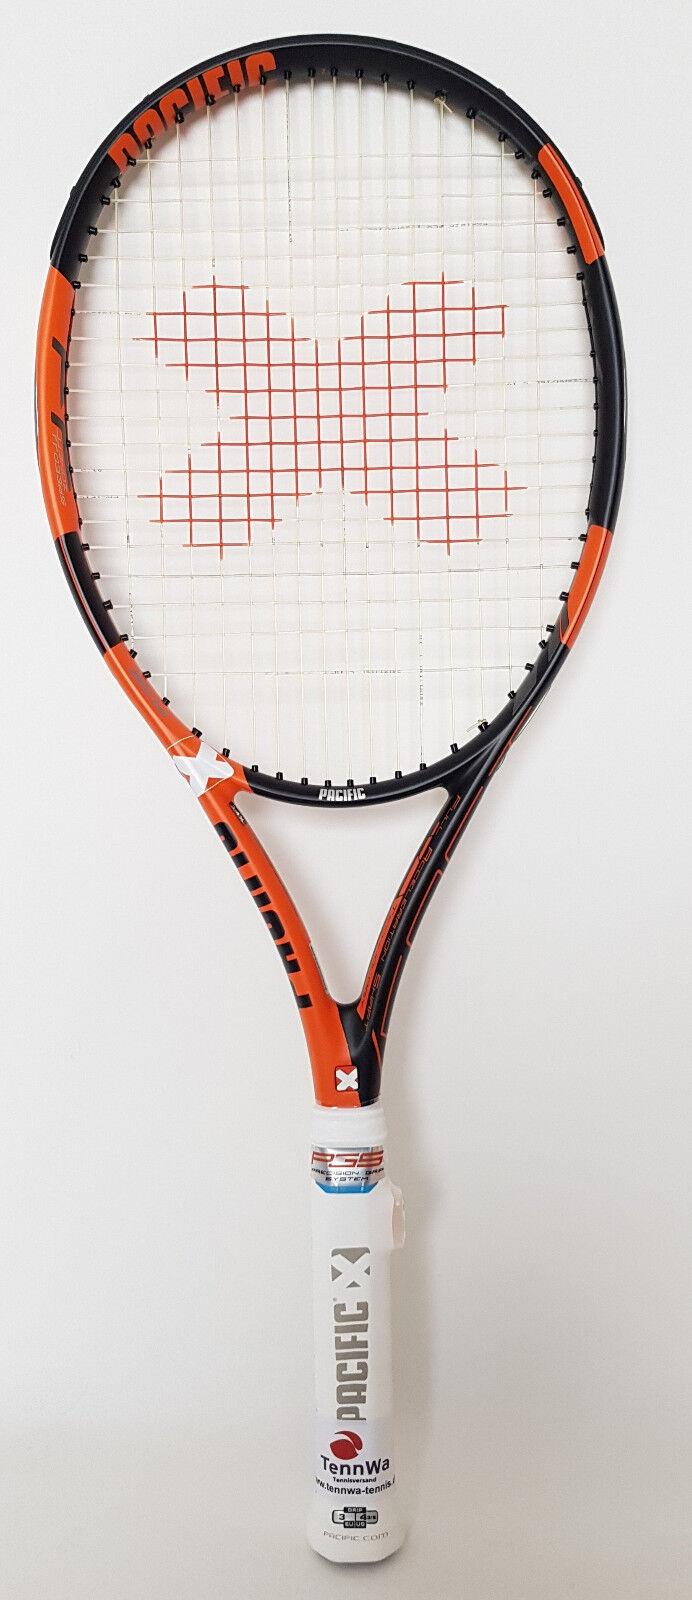 NEU: PACIFIC X Fast Pro 310g - Tennisschläger mit Besaitung - statt 229,95 EUR*